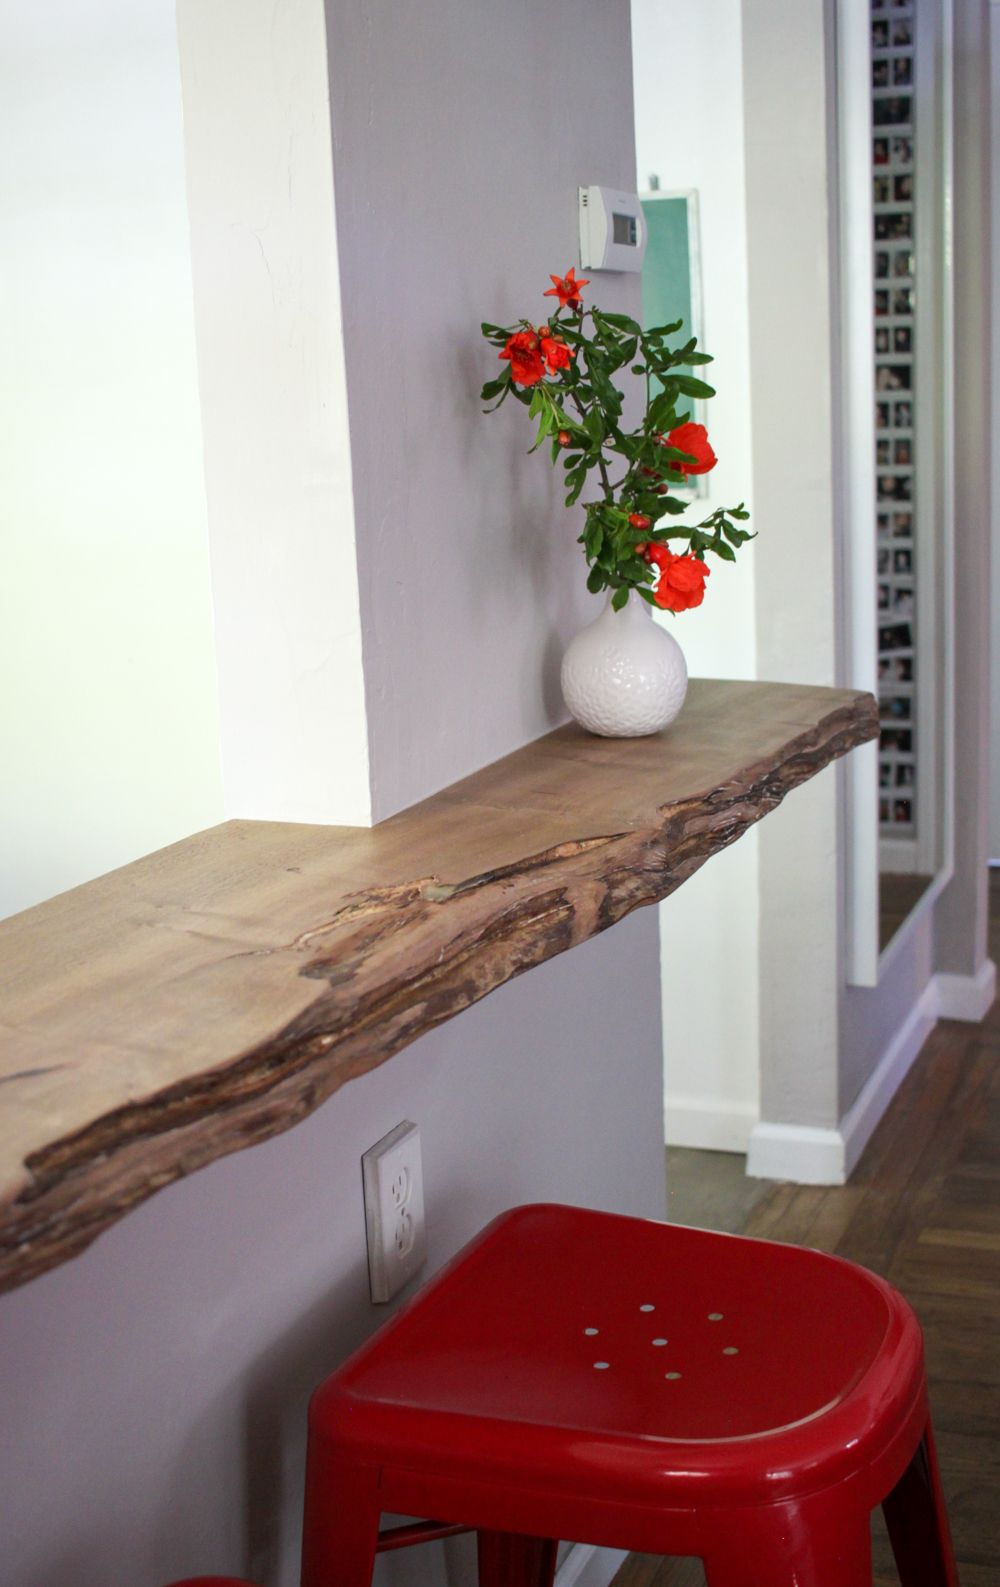 Pin Von Kym Ruiz Auf Homey Things Fensterbank Innen Holz Diy Mobel Design Fensterbanke Holz